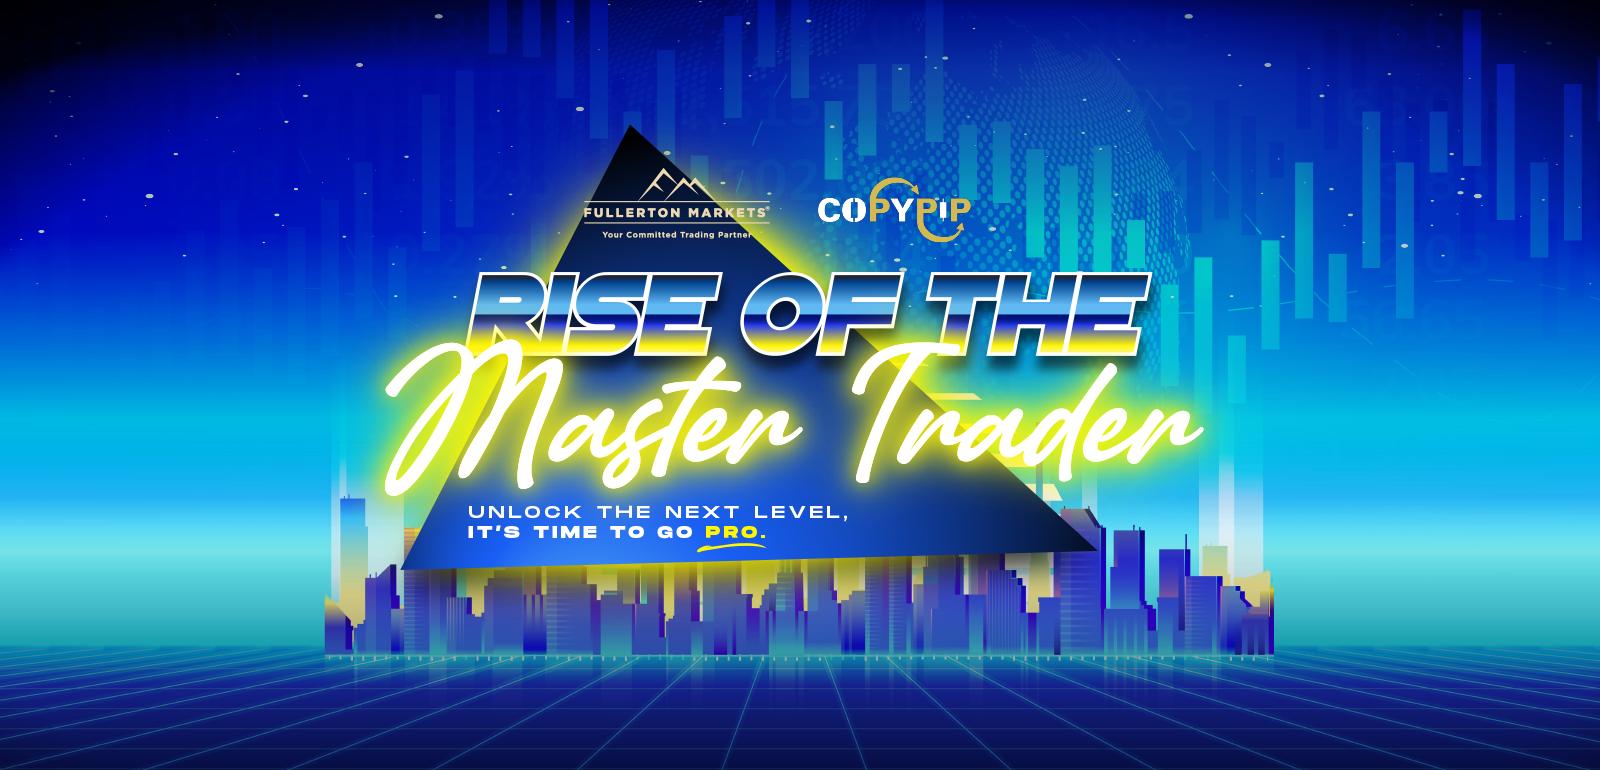 CopyPip-Pro-Trading-Contest_1600x770px_en